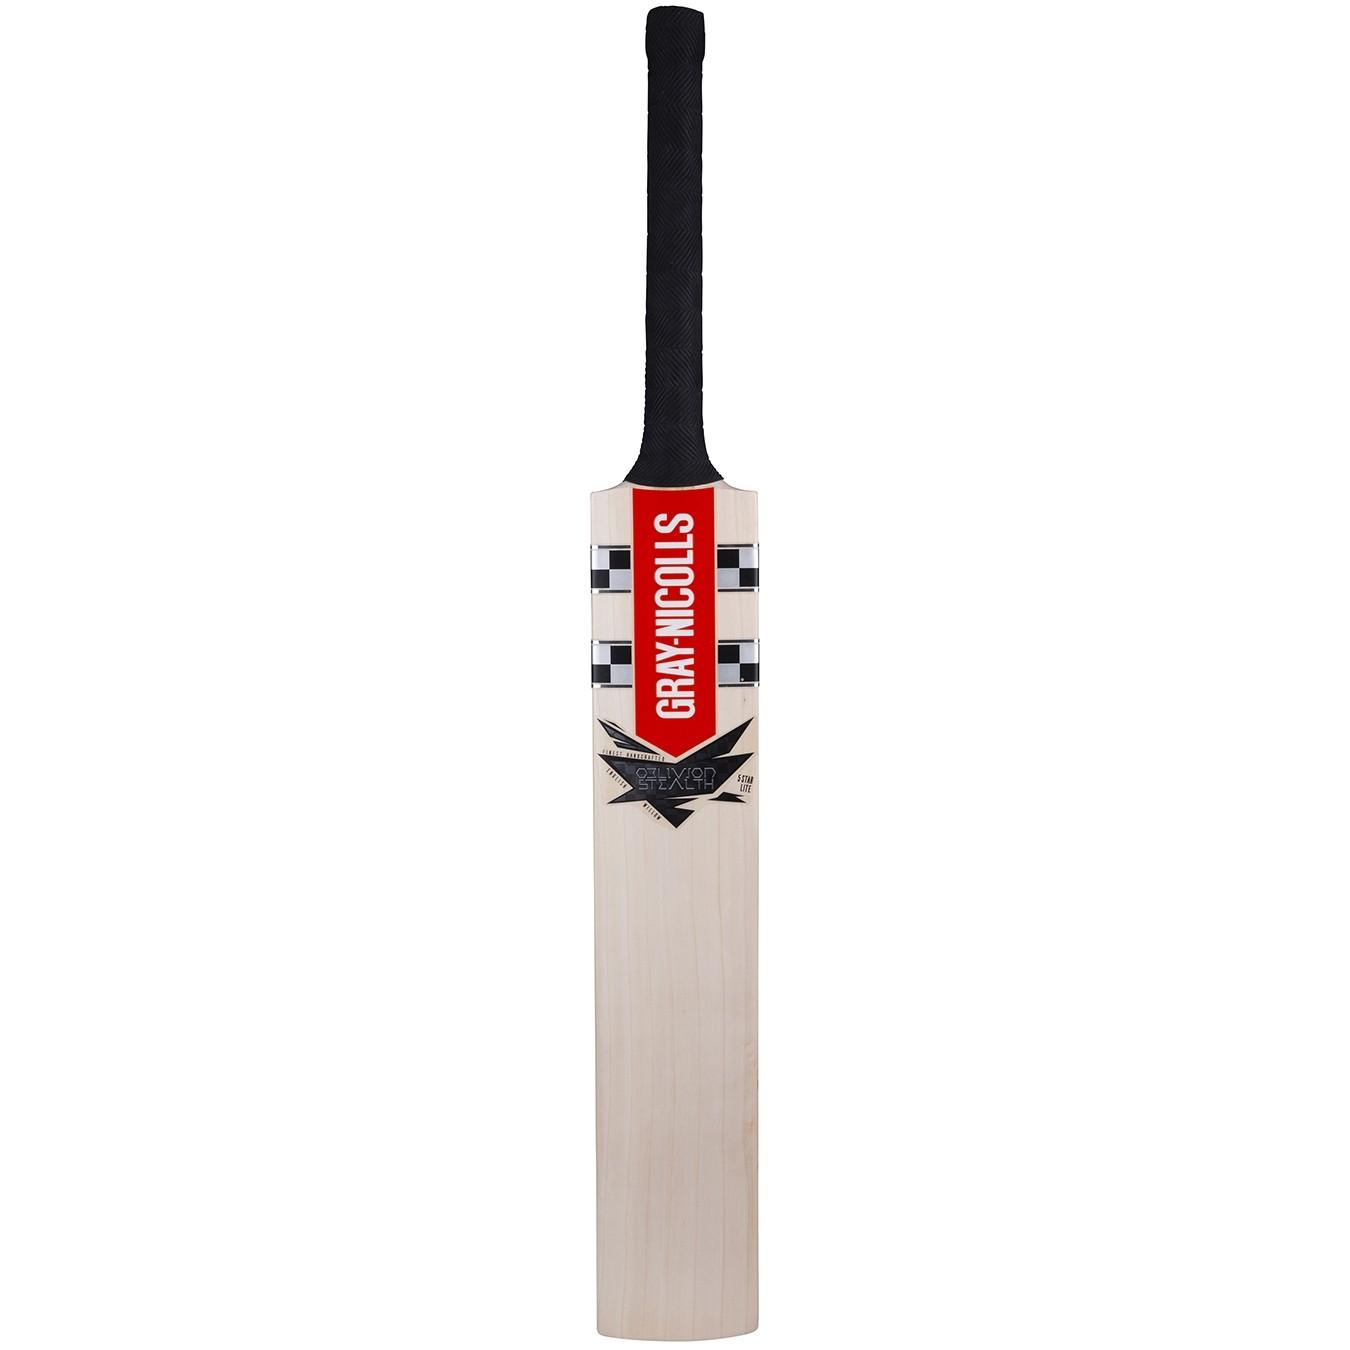 2021 Gray Nicolls Oblivion Stealth 200 Junior Cricket Bat